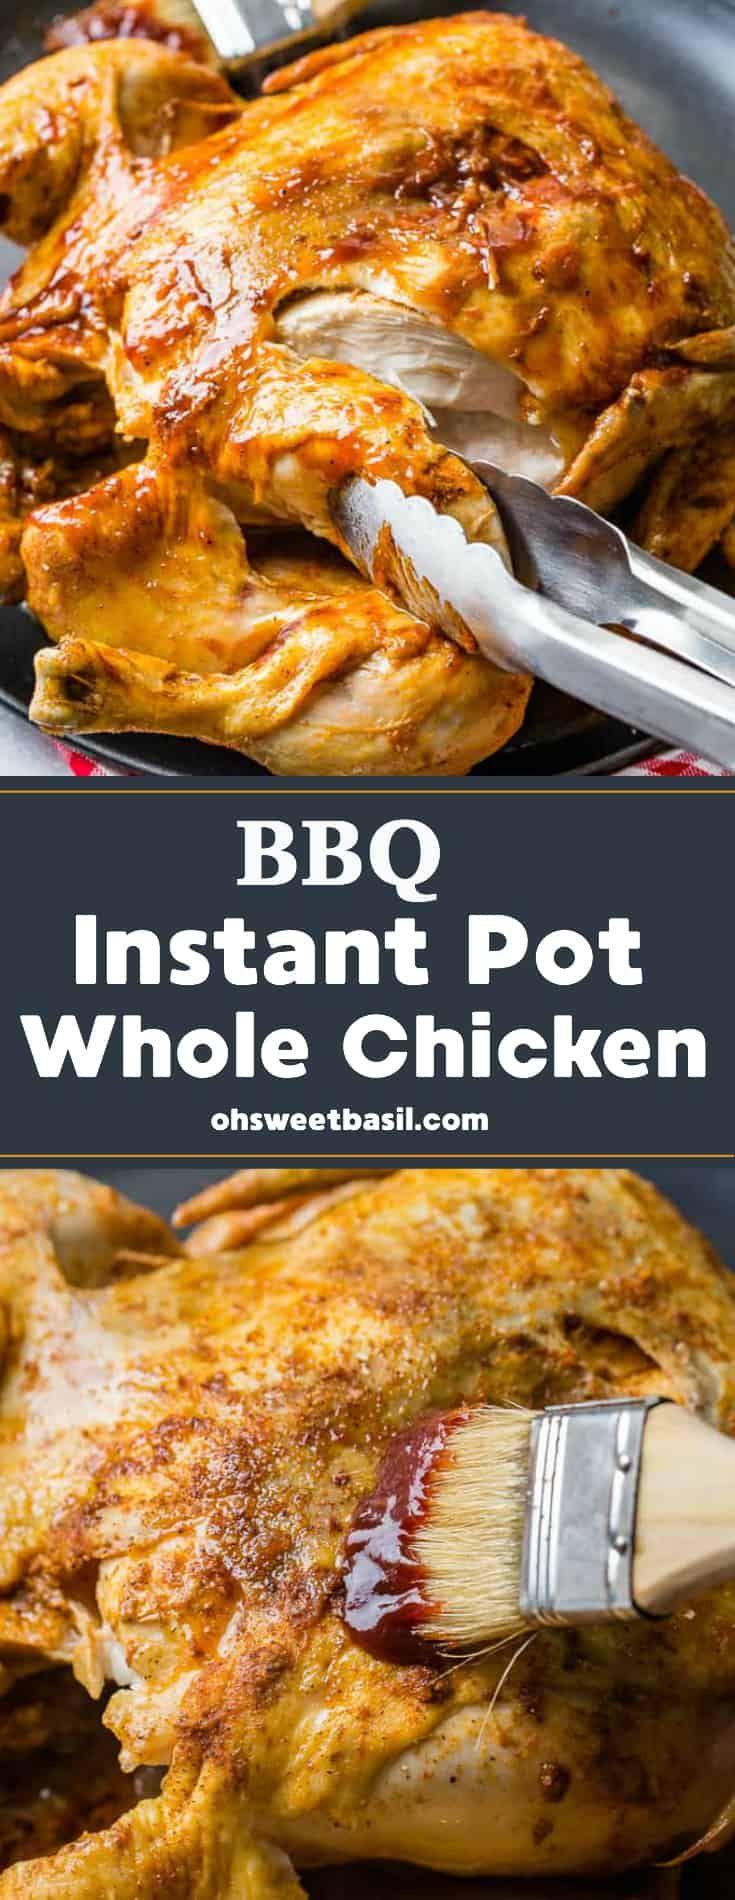 Bbq Instant Pot Whole Chicken  Recipe In 2019  Bbq -8840